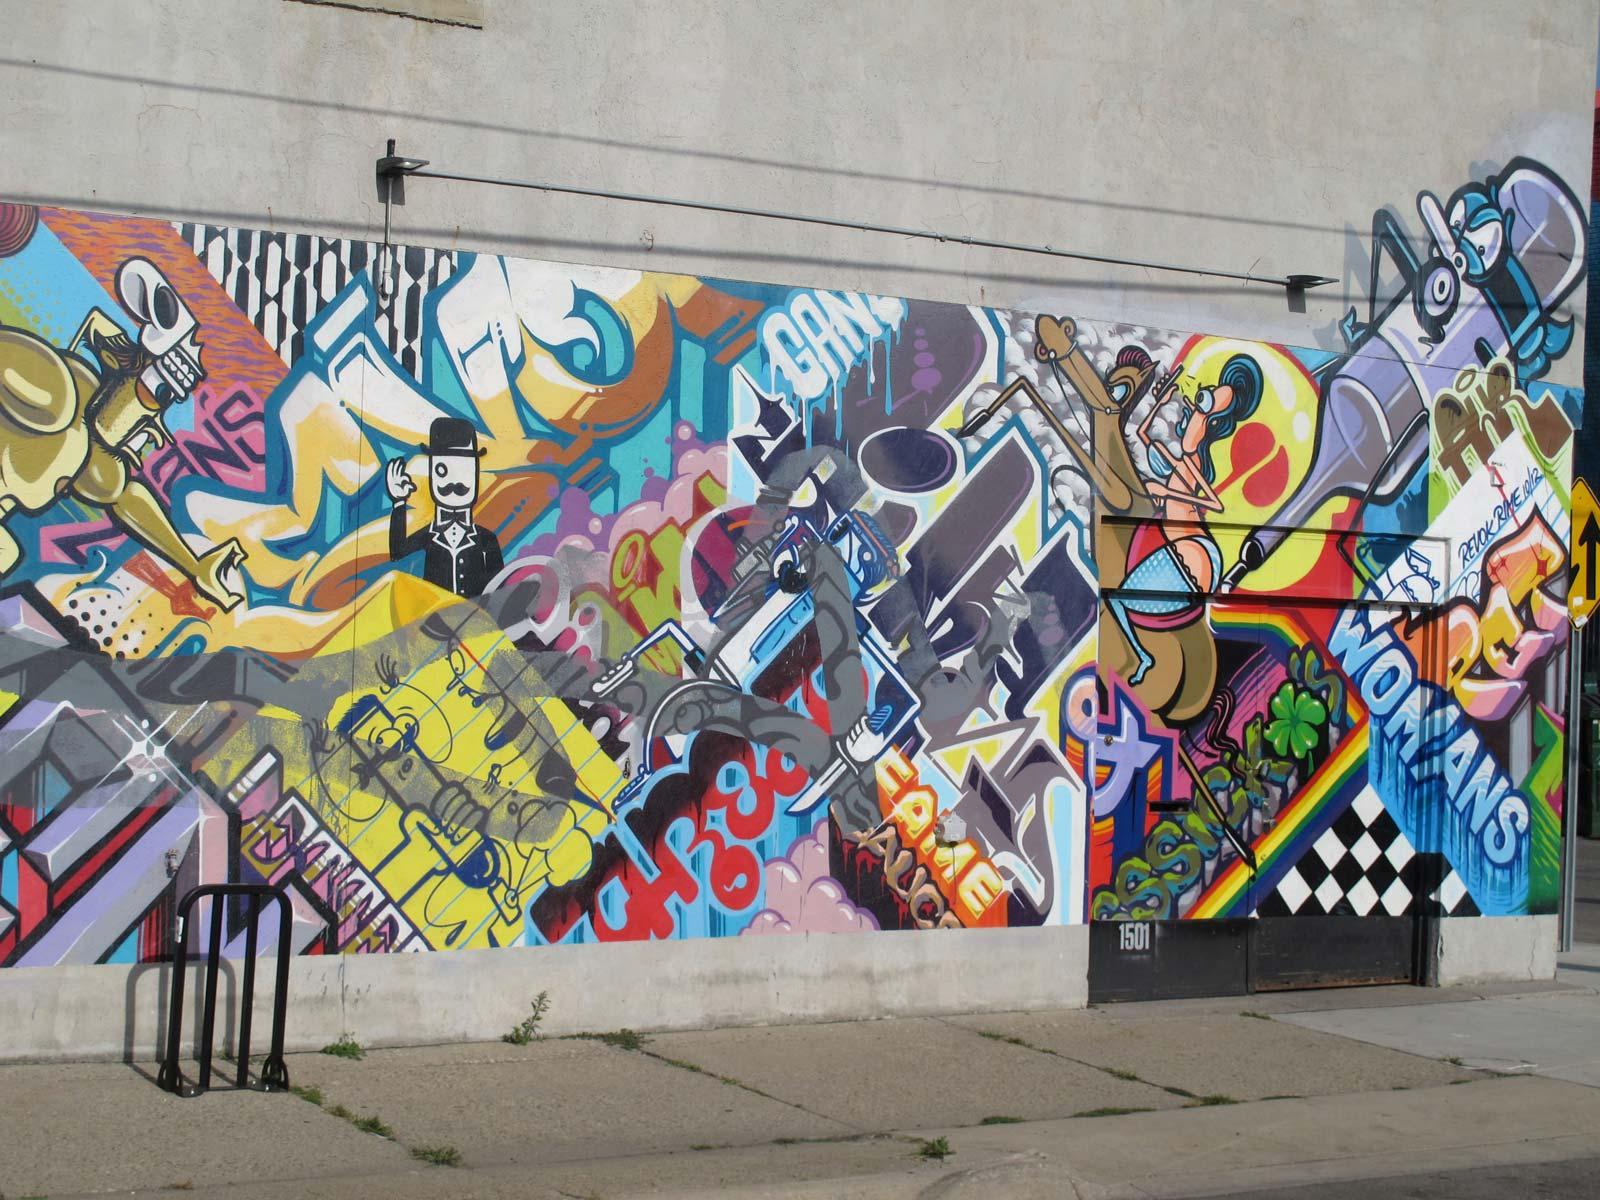 DetroitWall_9372.jpg